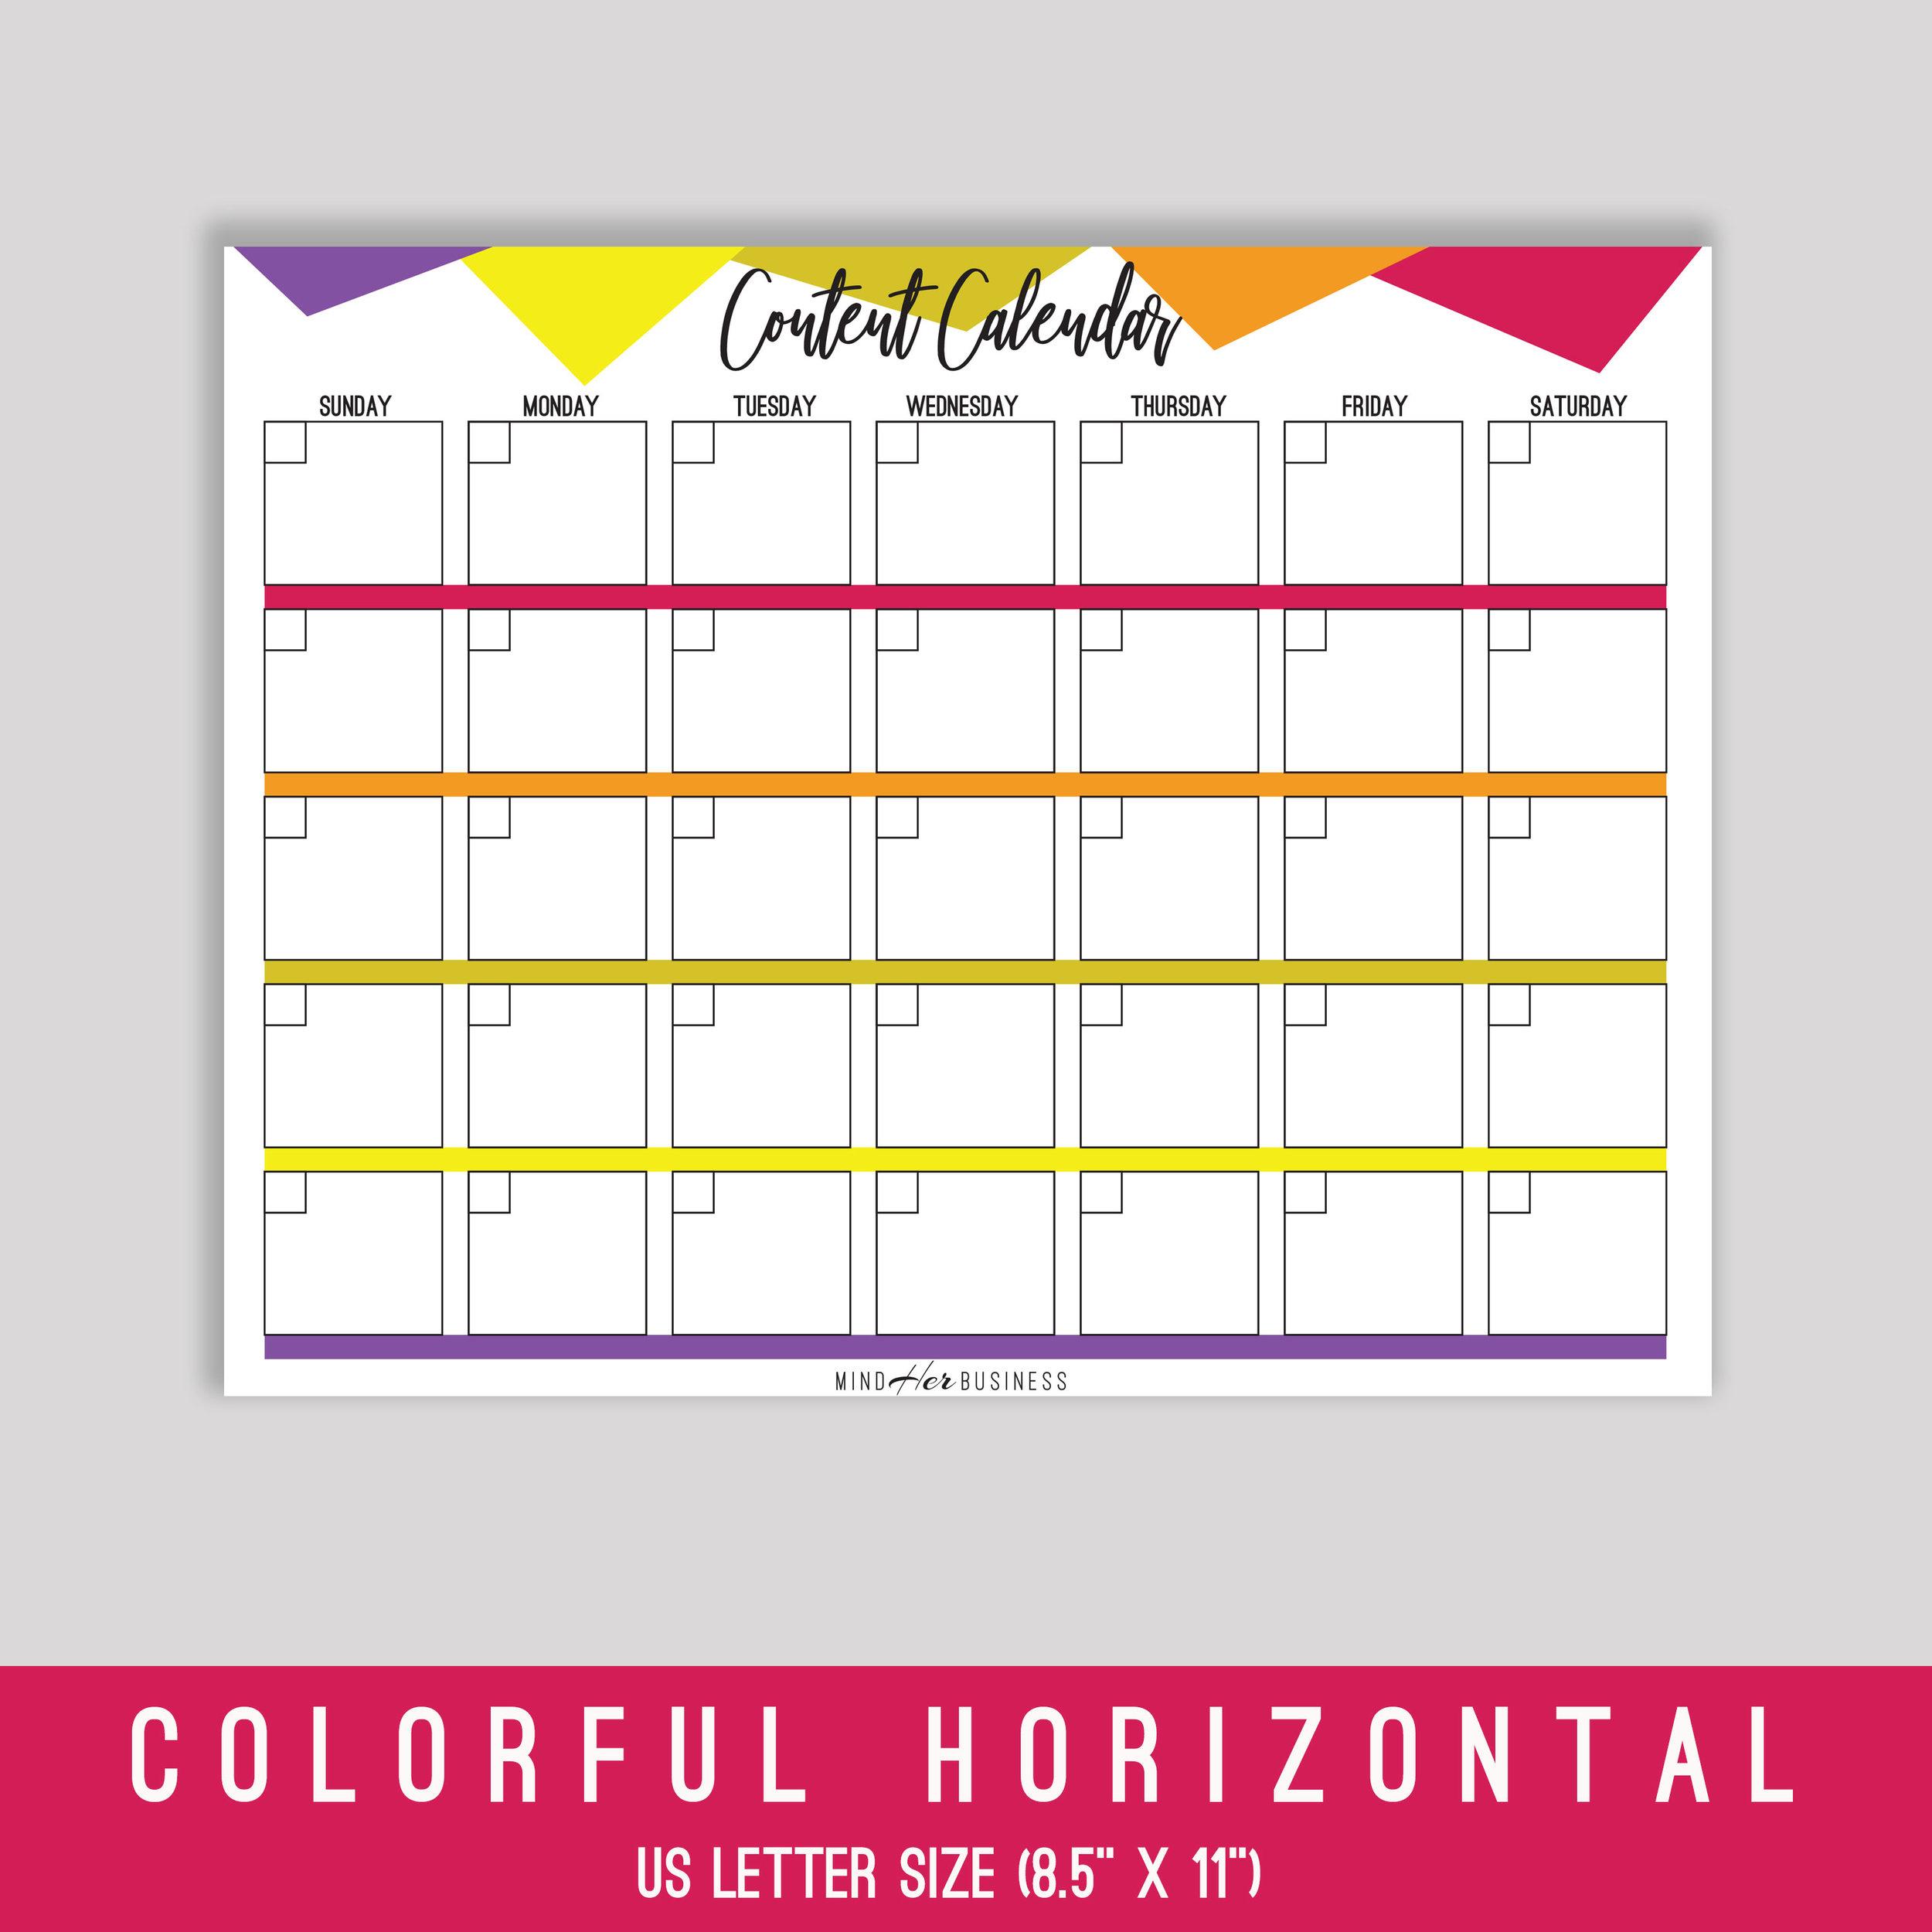 mhb-calendar-mockup-colorful-horizontal-letter.jpg